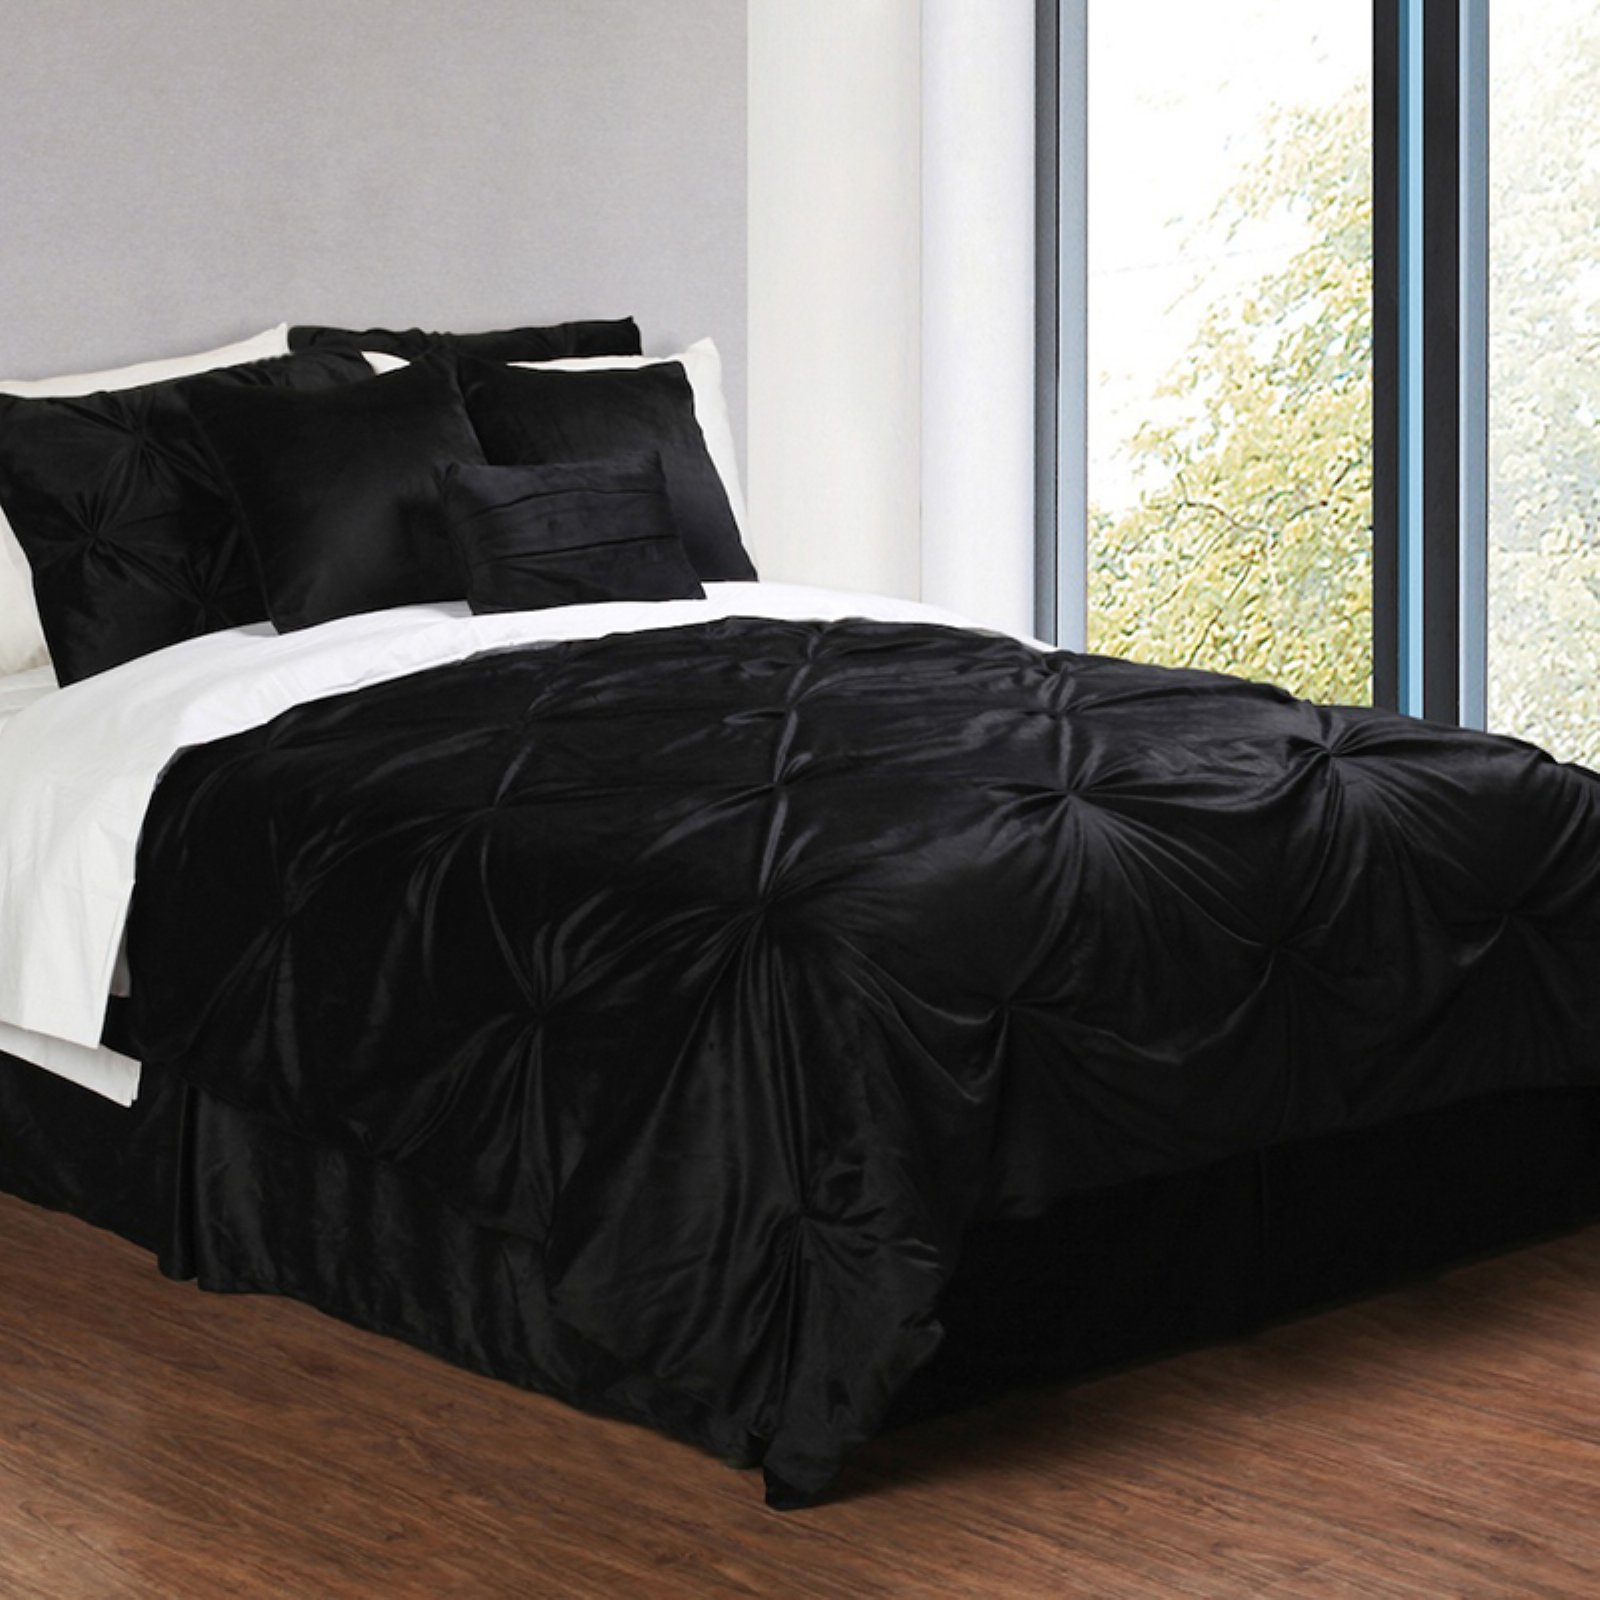 Pintuck Plush 6-Piece Complete Comforter Set